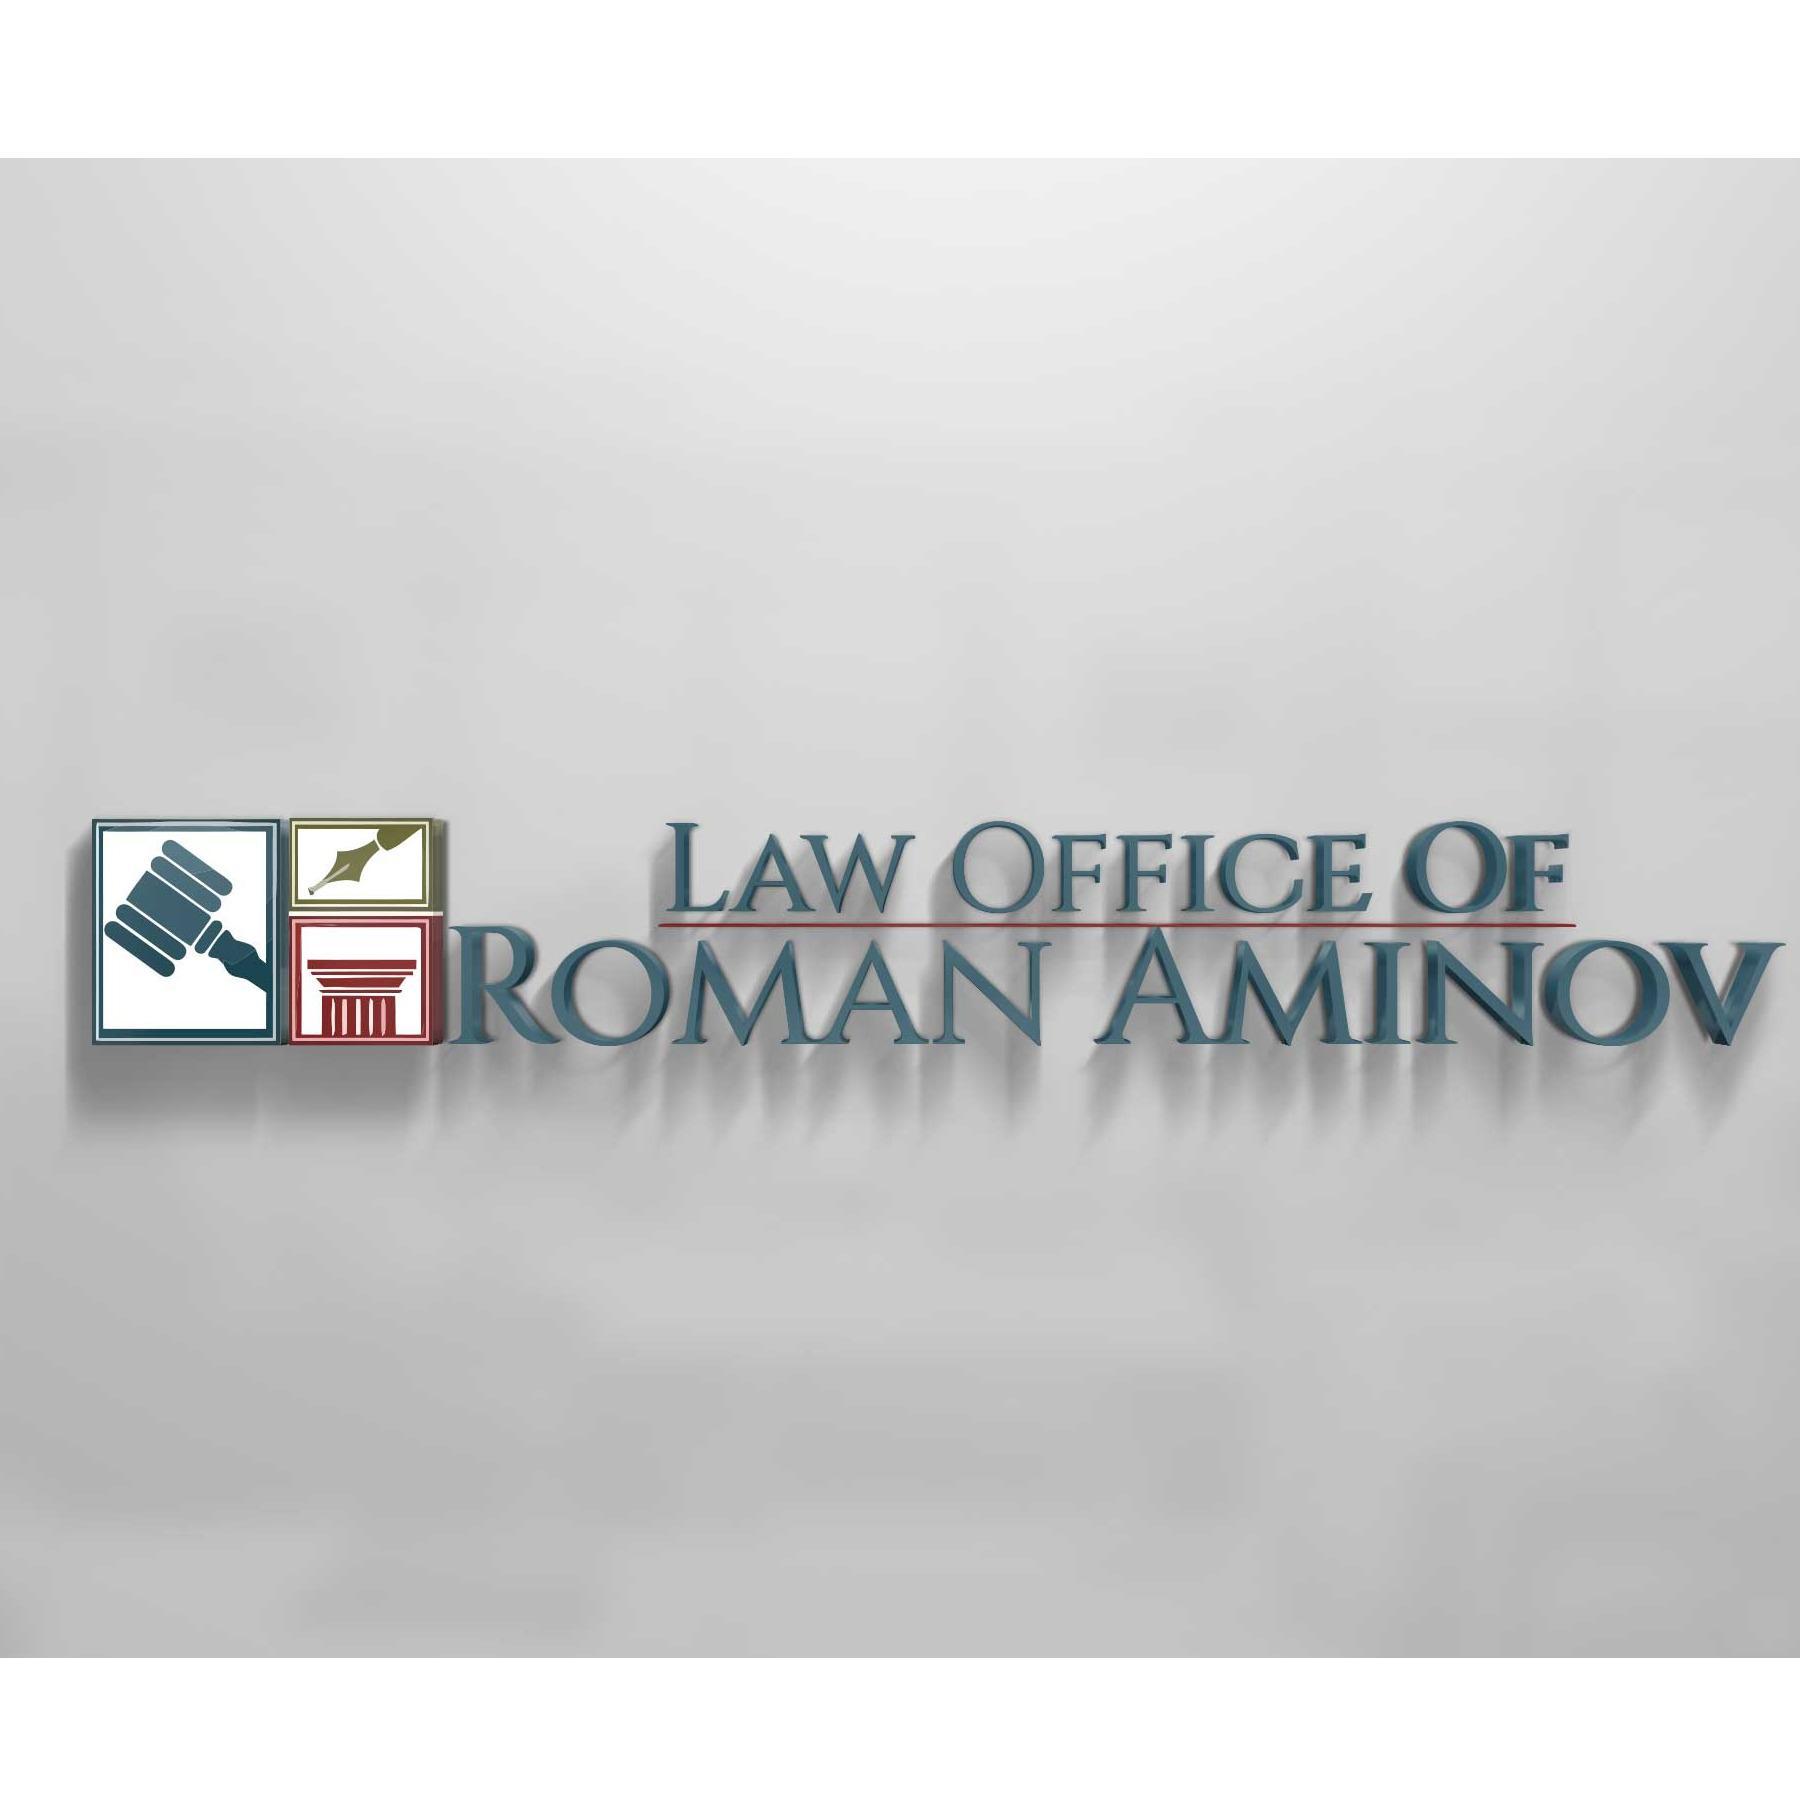 Law Offices Of Roman Aminov